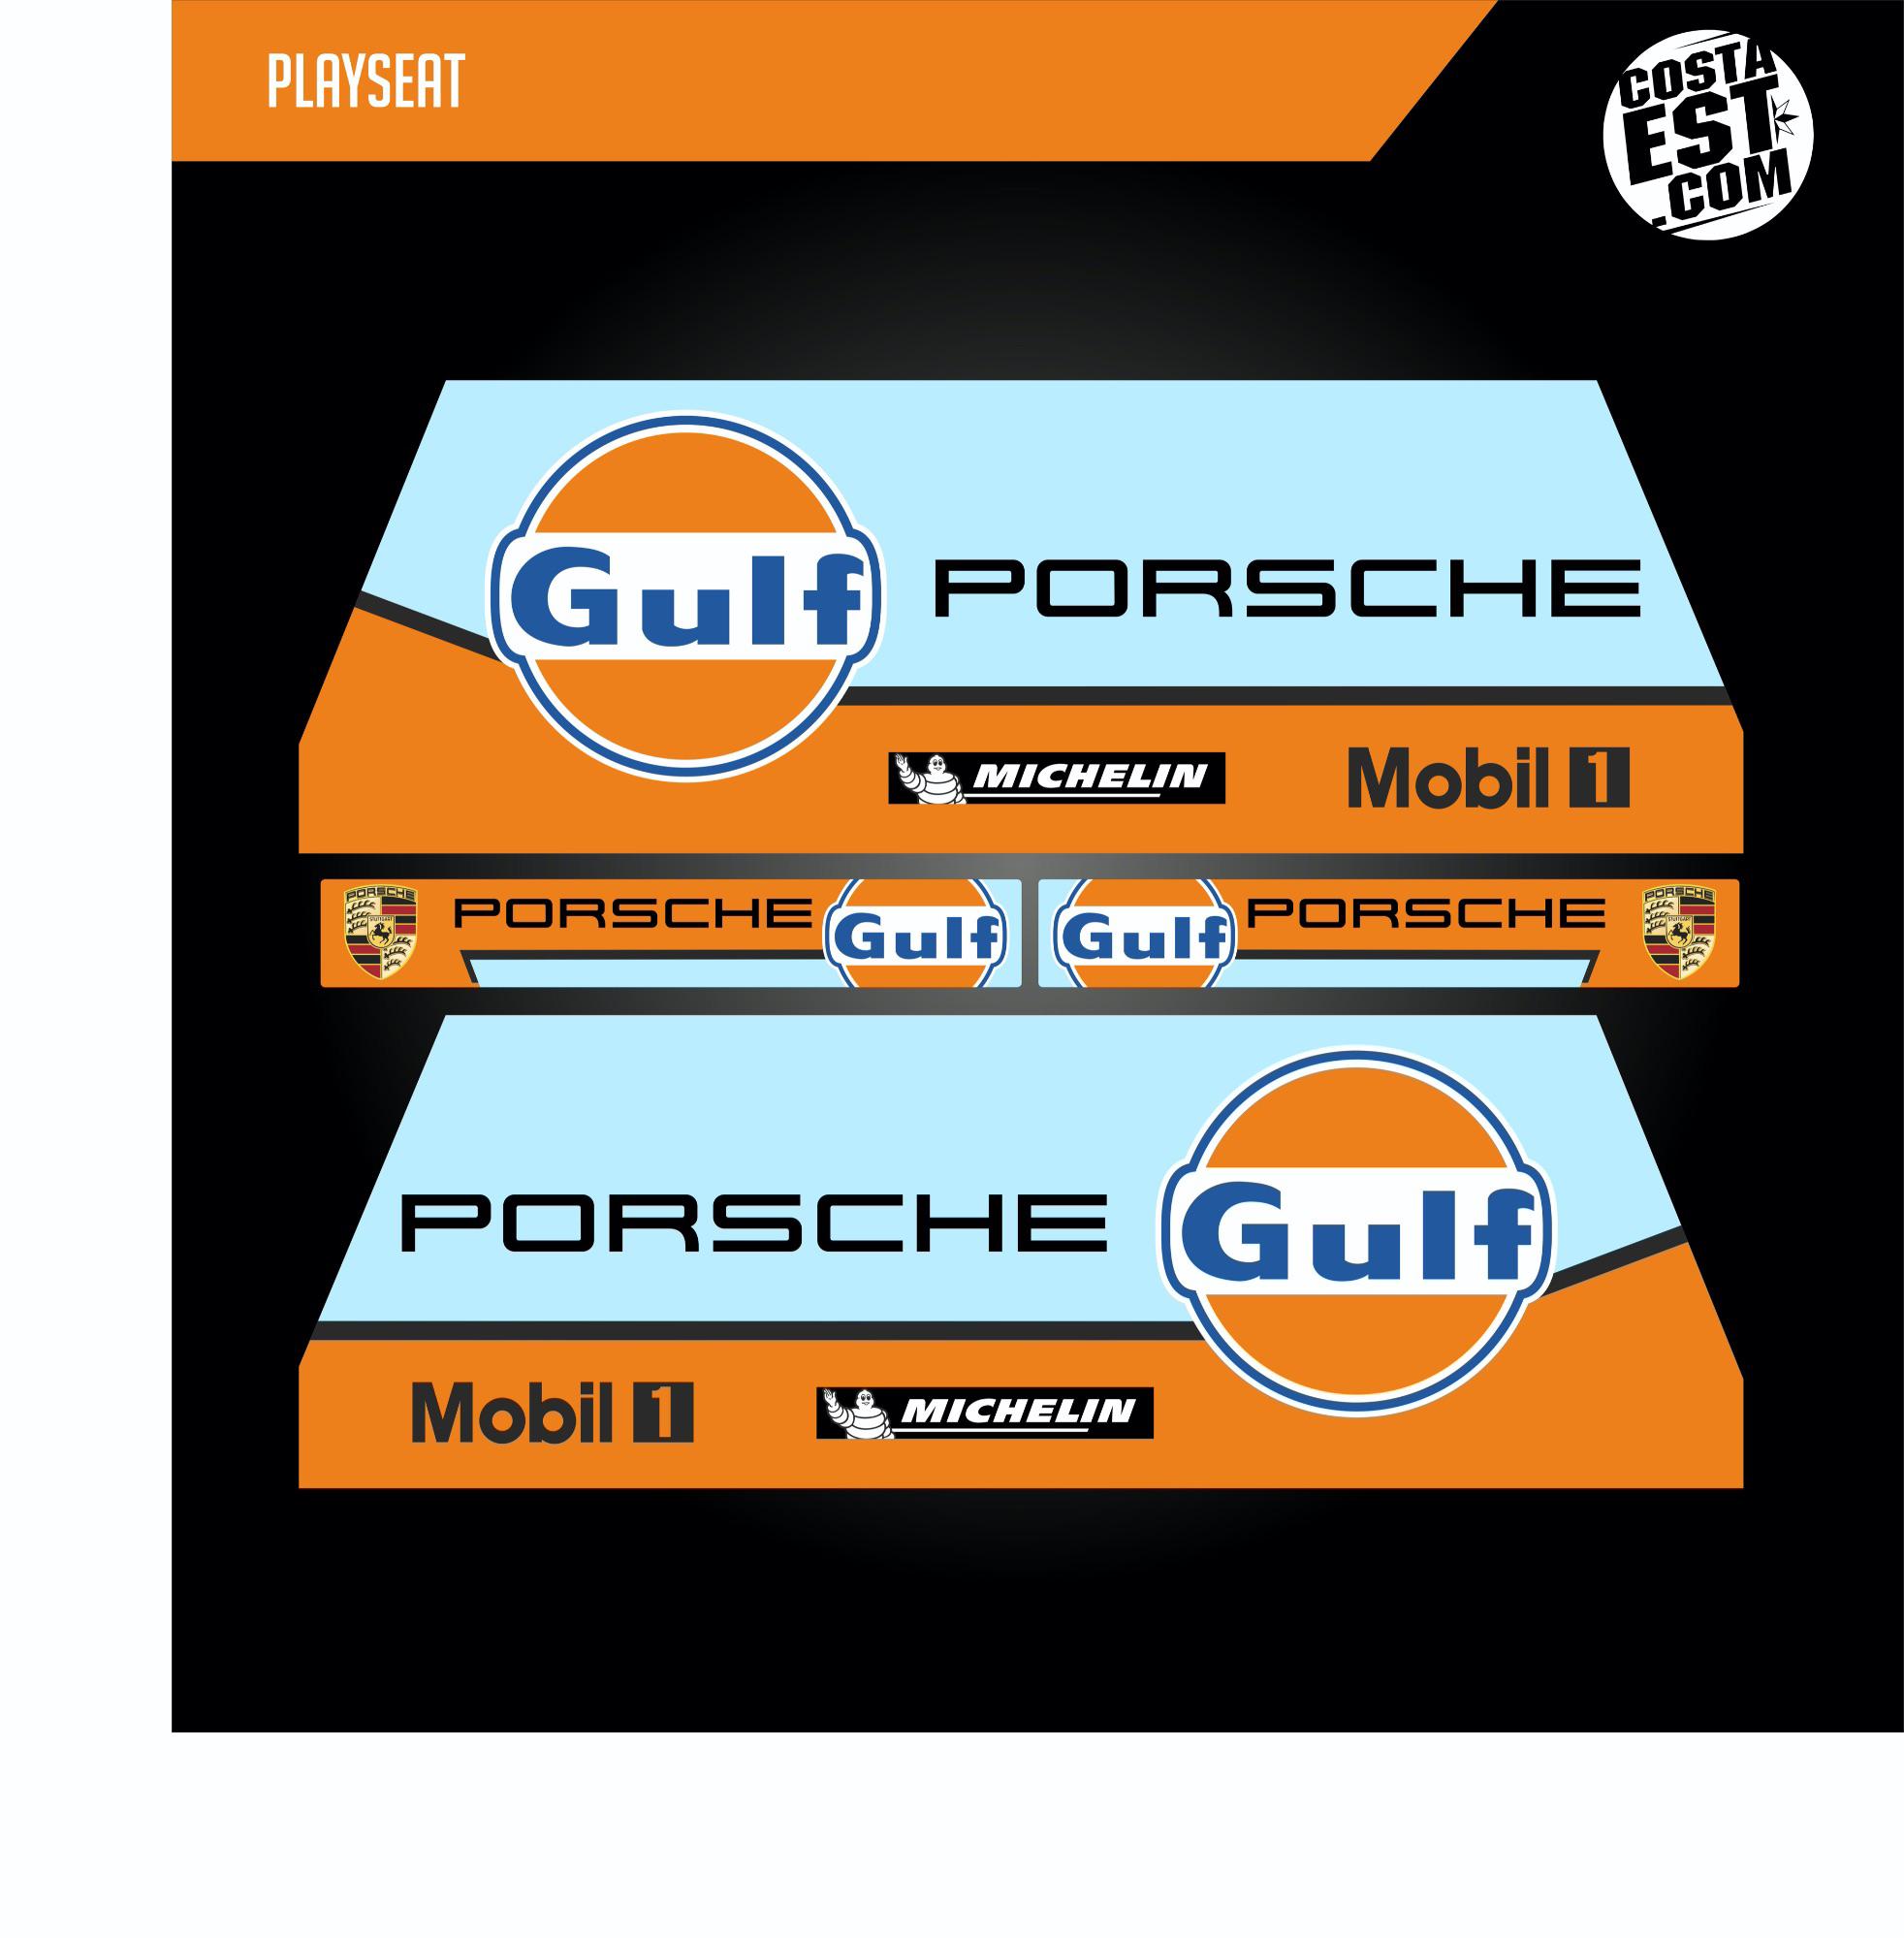 sticker-plyseat-replica-gulf